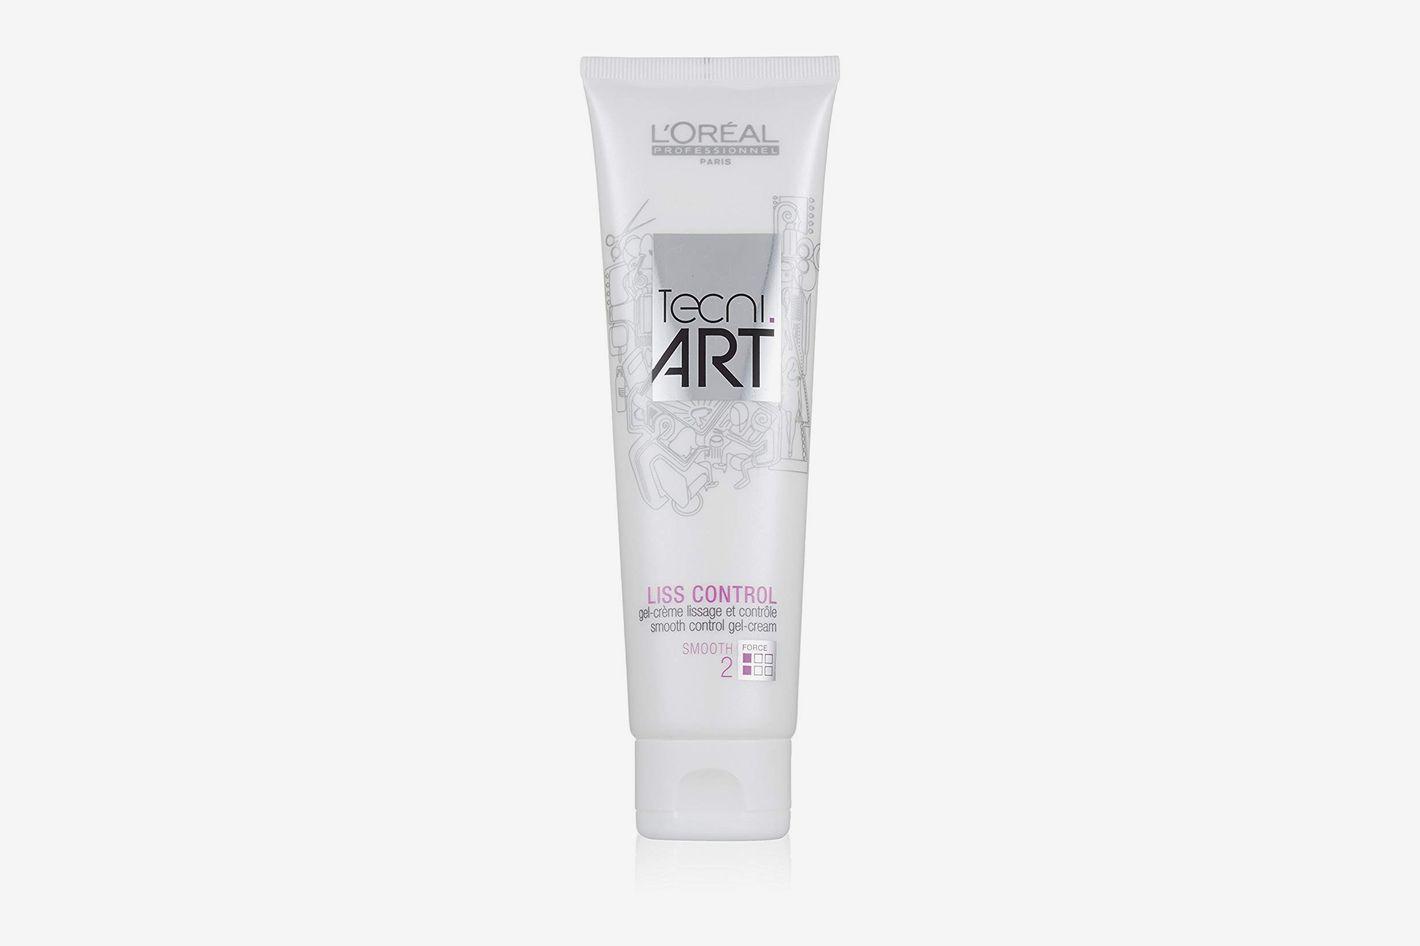 L'Oreal Professional Tecni Art Liss Smooth Control Gel Cream